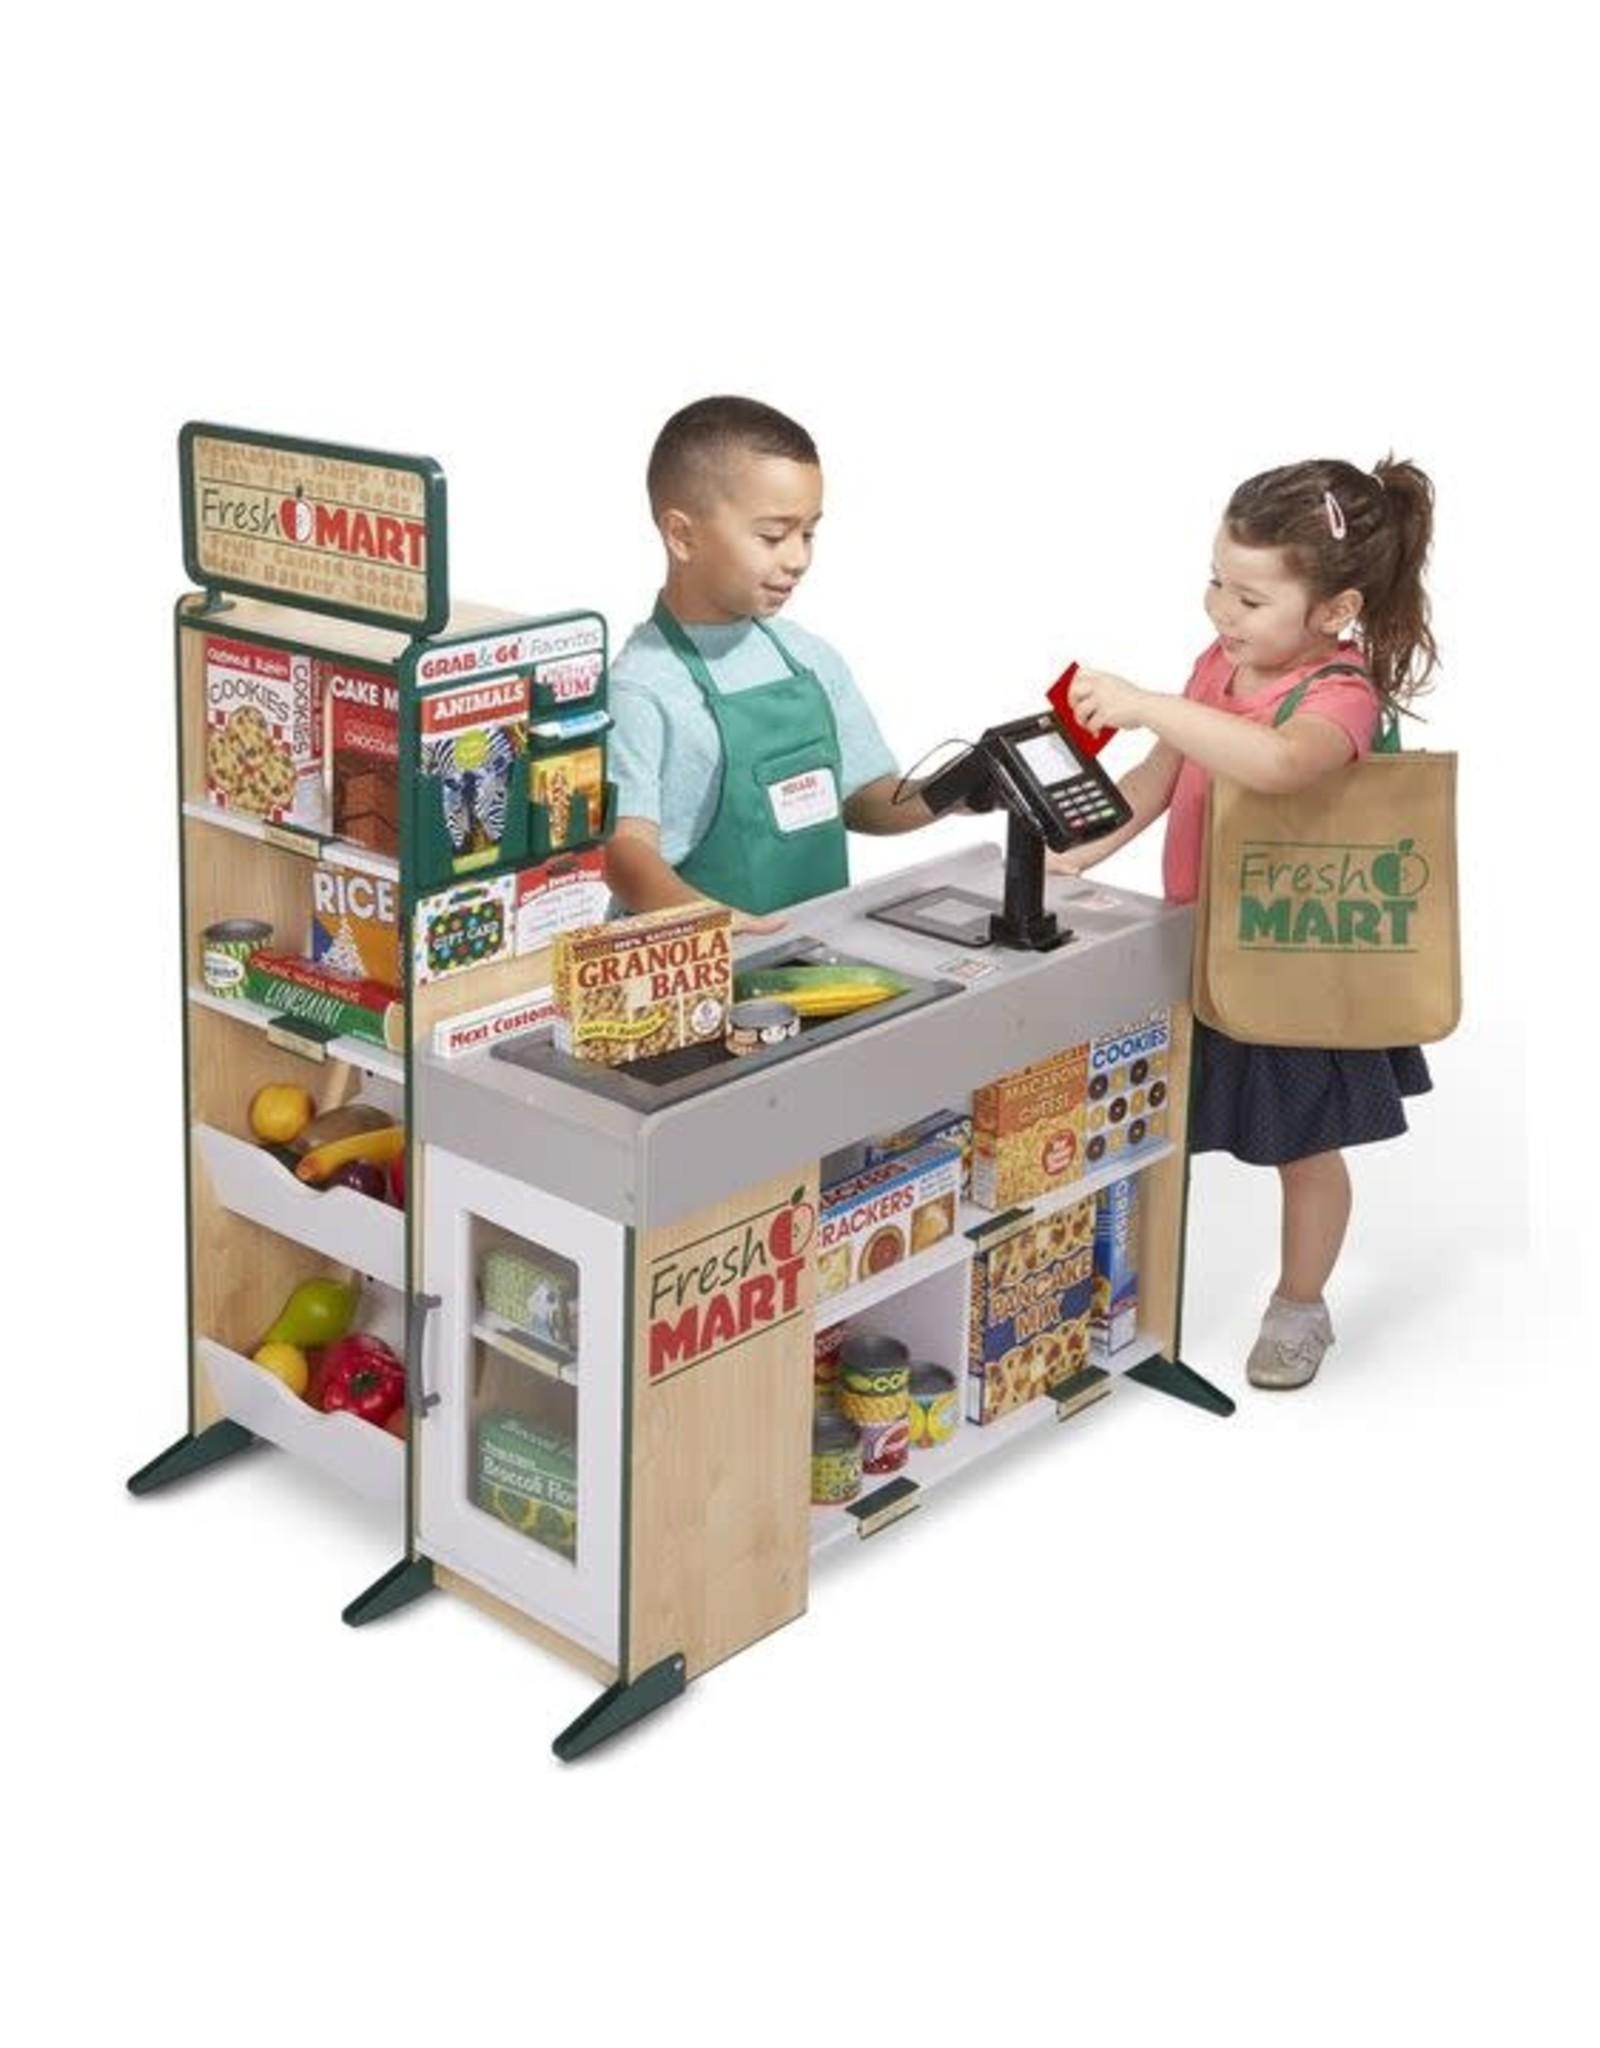 Melissa & Doug Fresh Mart Grocery Store